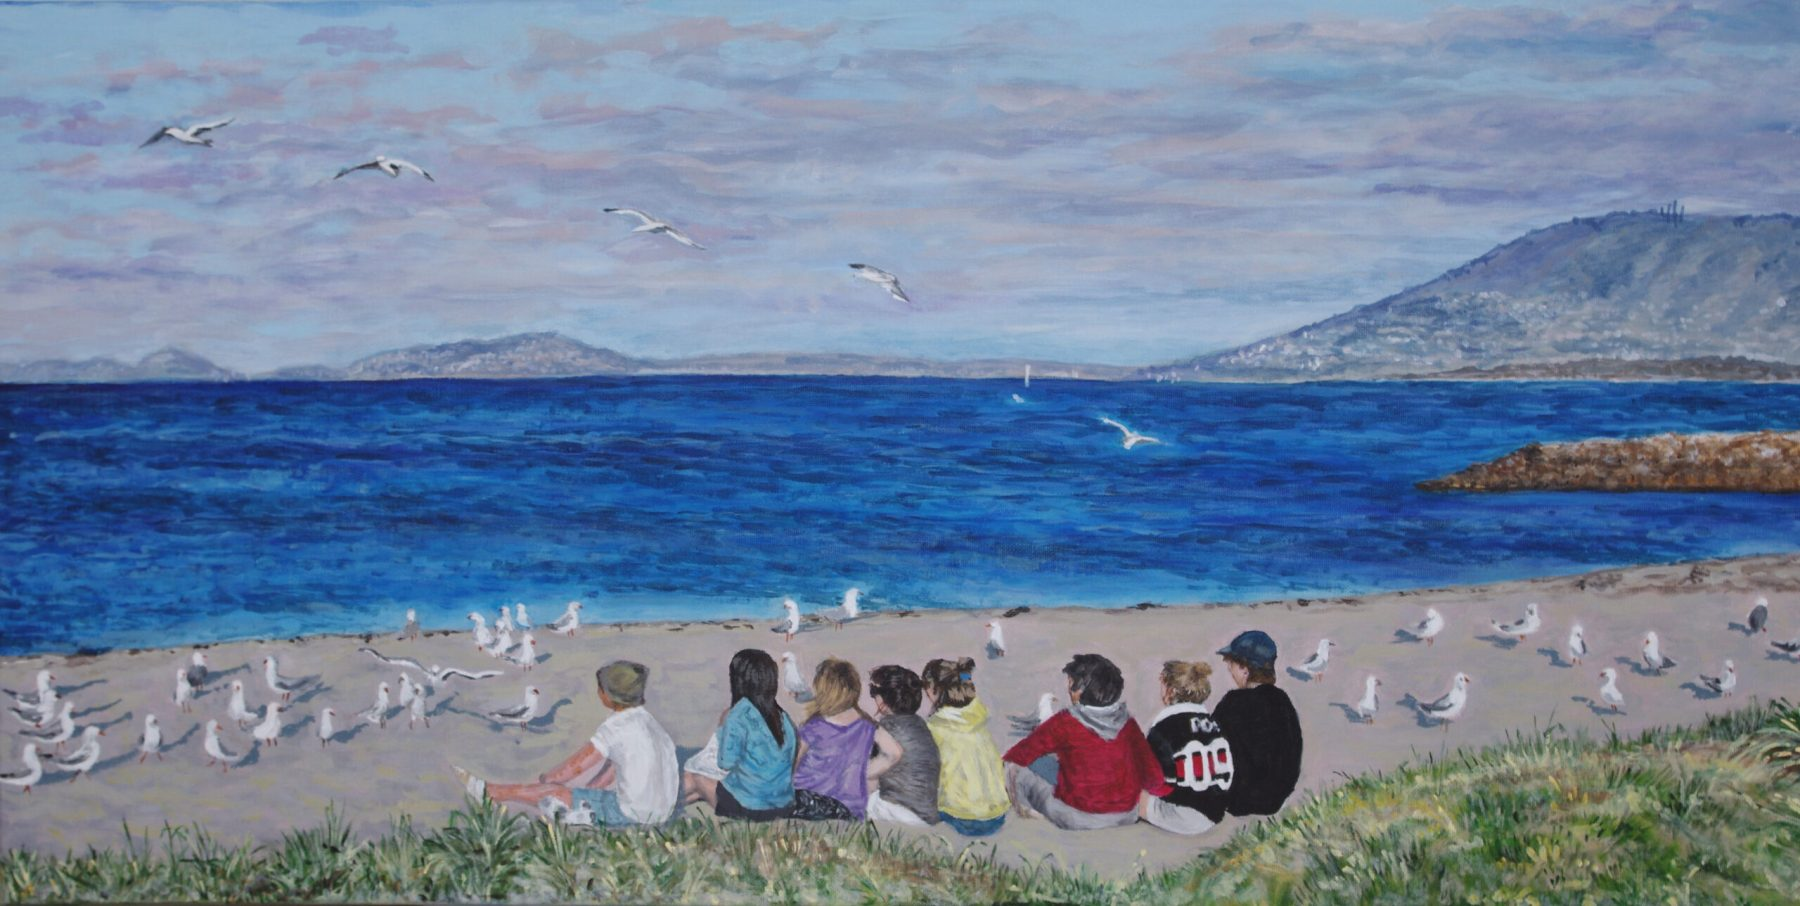 Natalie Doubrovski - Kids and Seagulls